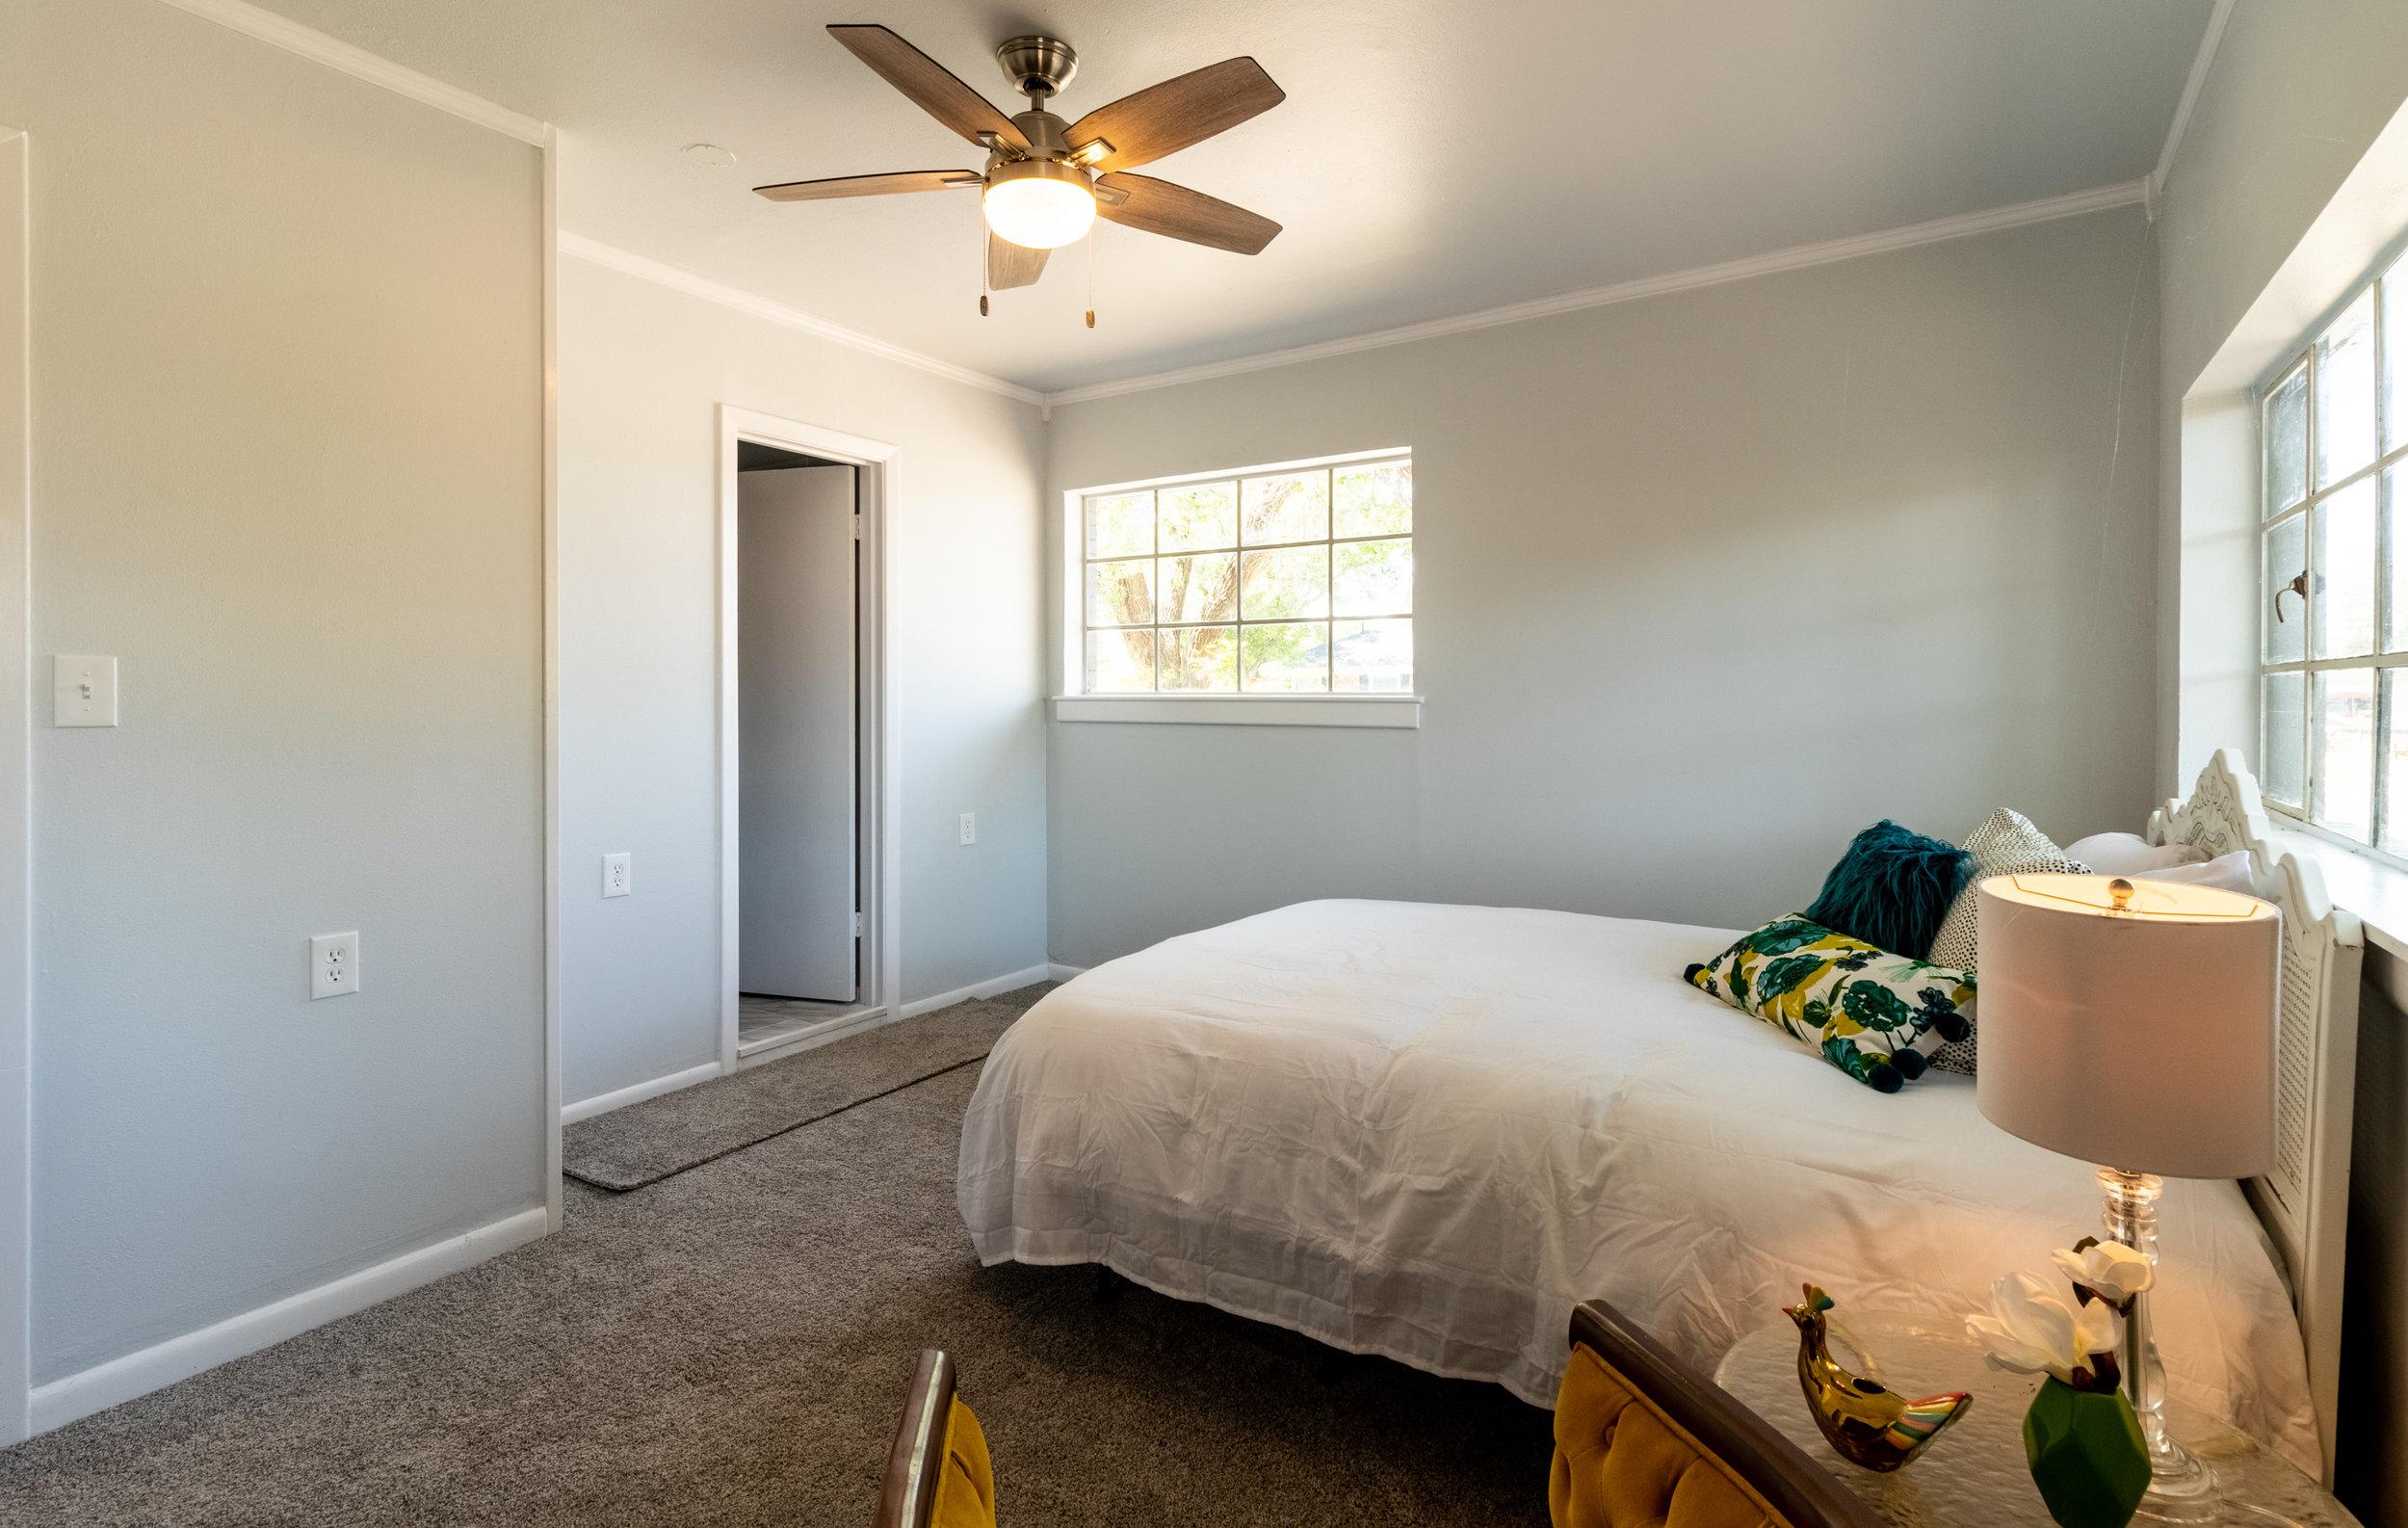 20 - 3rd Bedroom 2.jpg